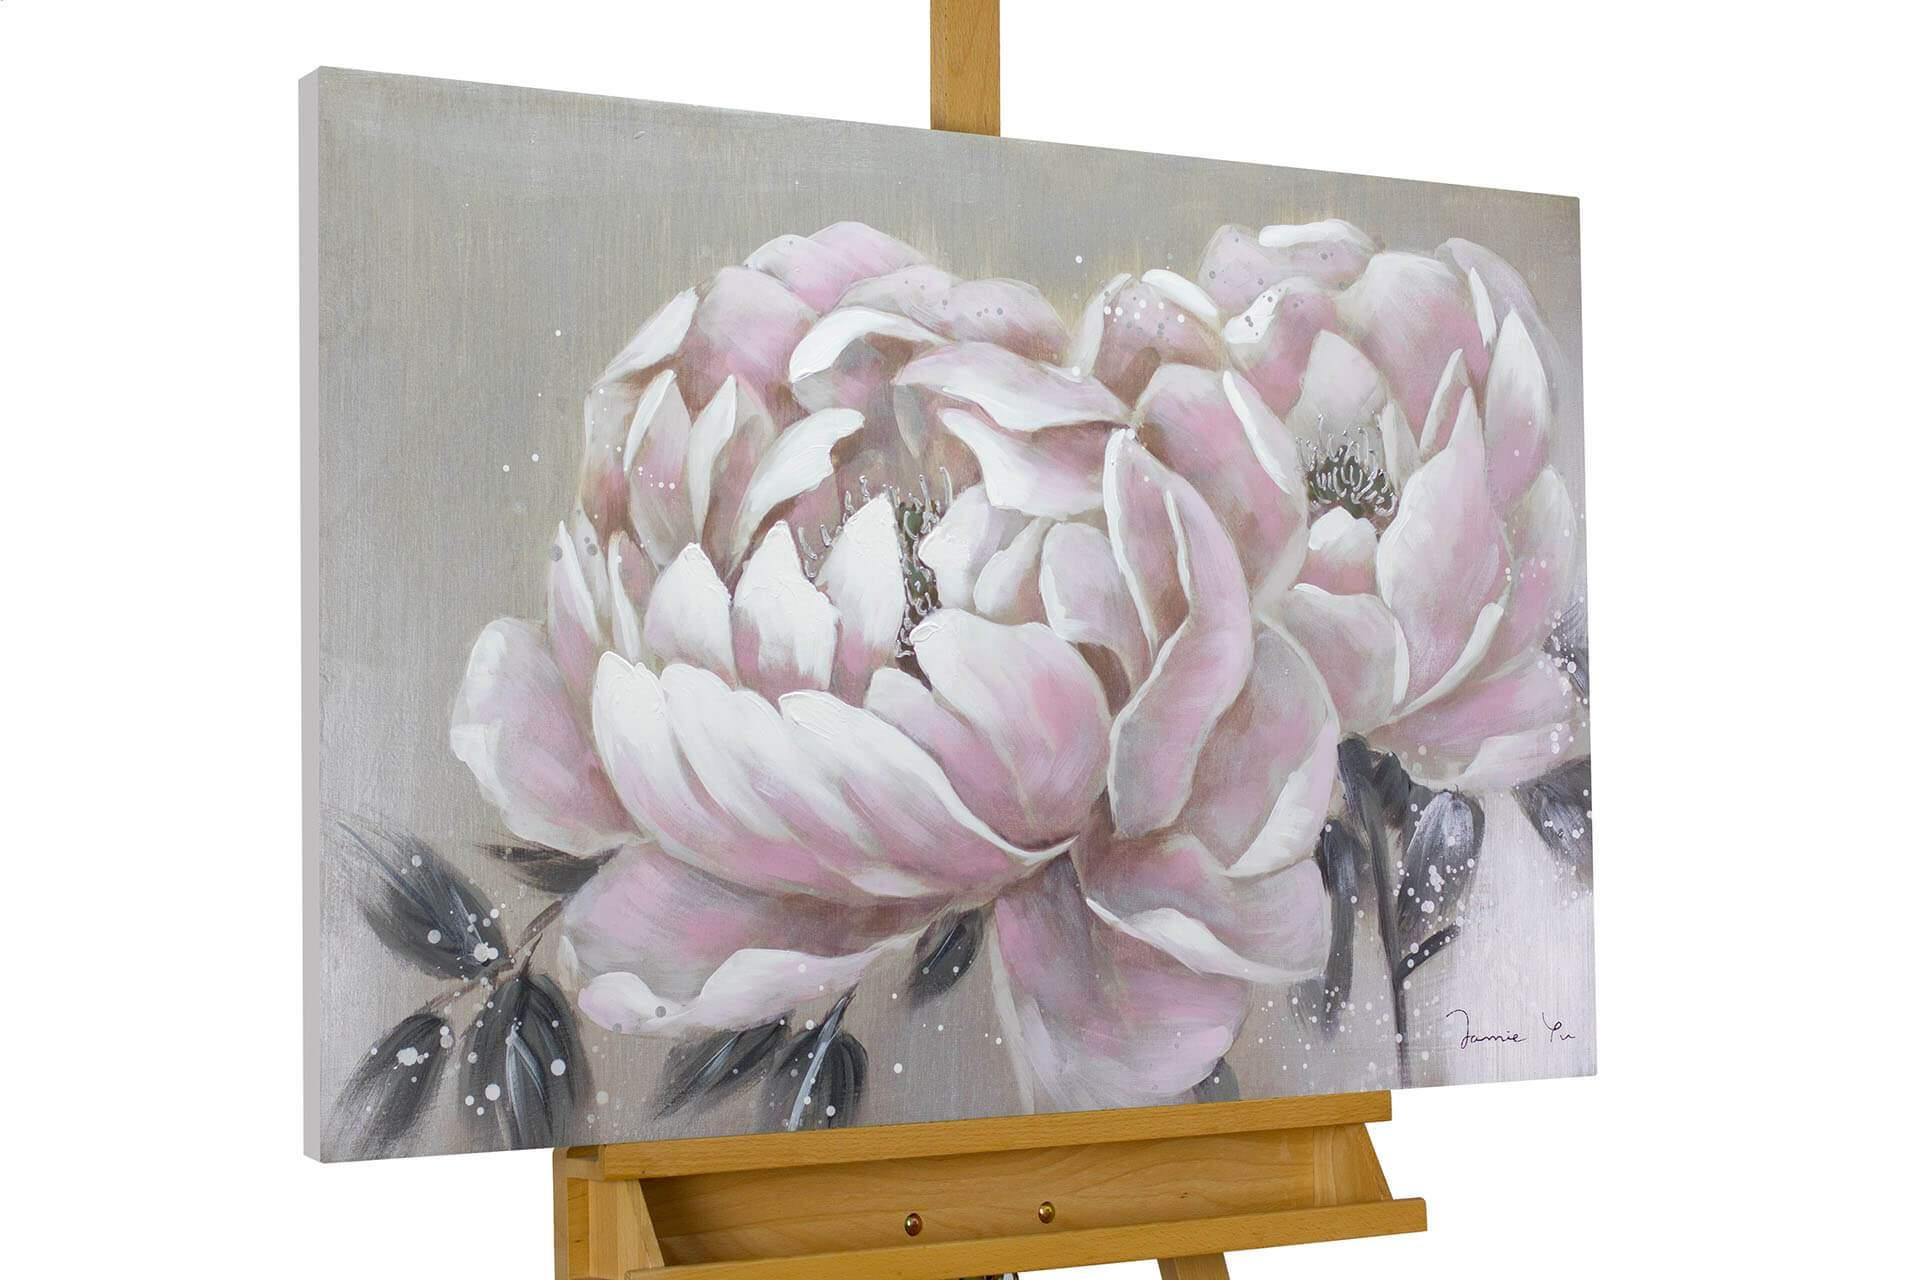 kl blume rosa grau modern acryl gemaelde oel bild 0257fe2b2c27d05